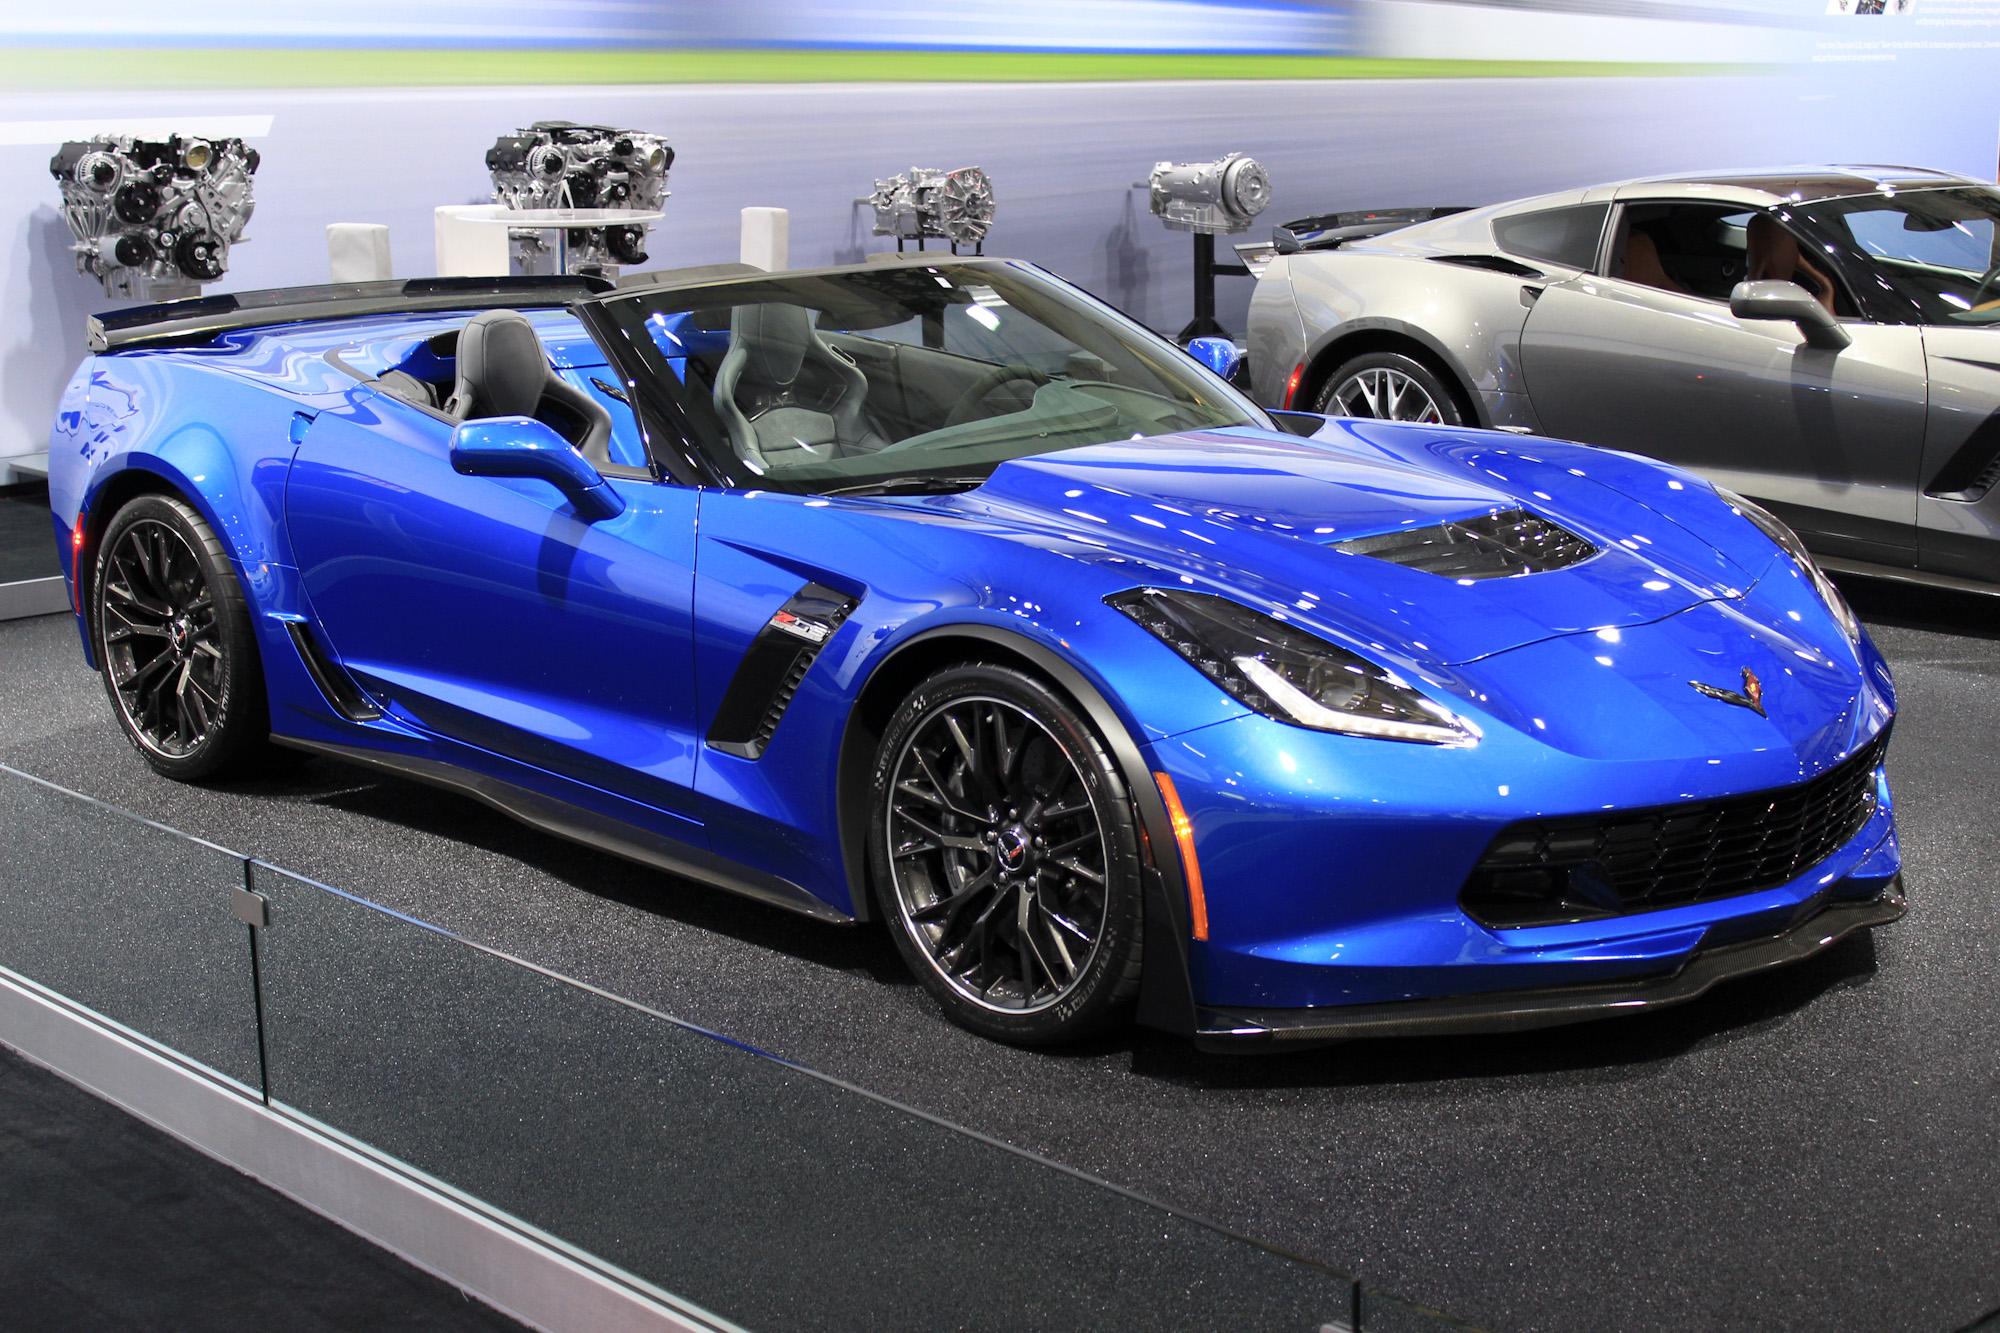 2015 Chevrolet Corvette Z06 Convertible: 2014 New York Auto Show Live Photos